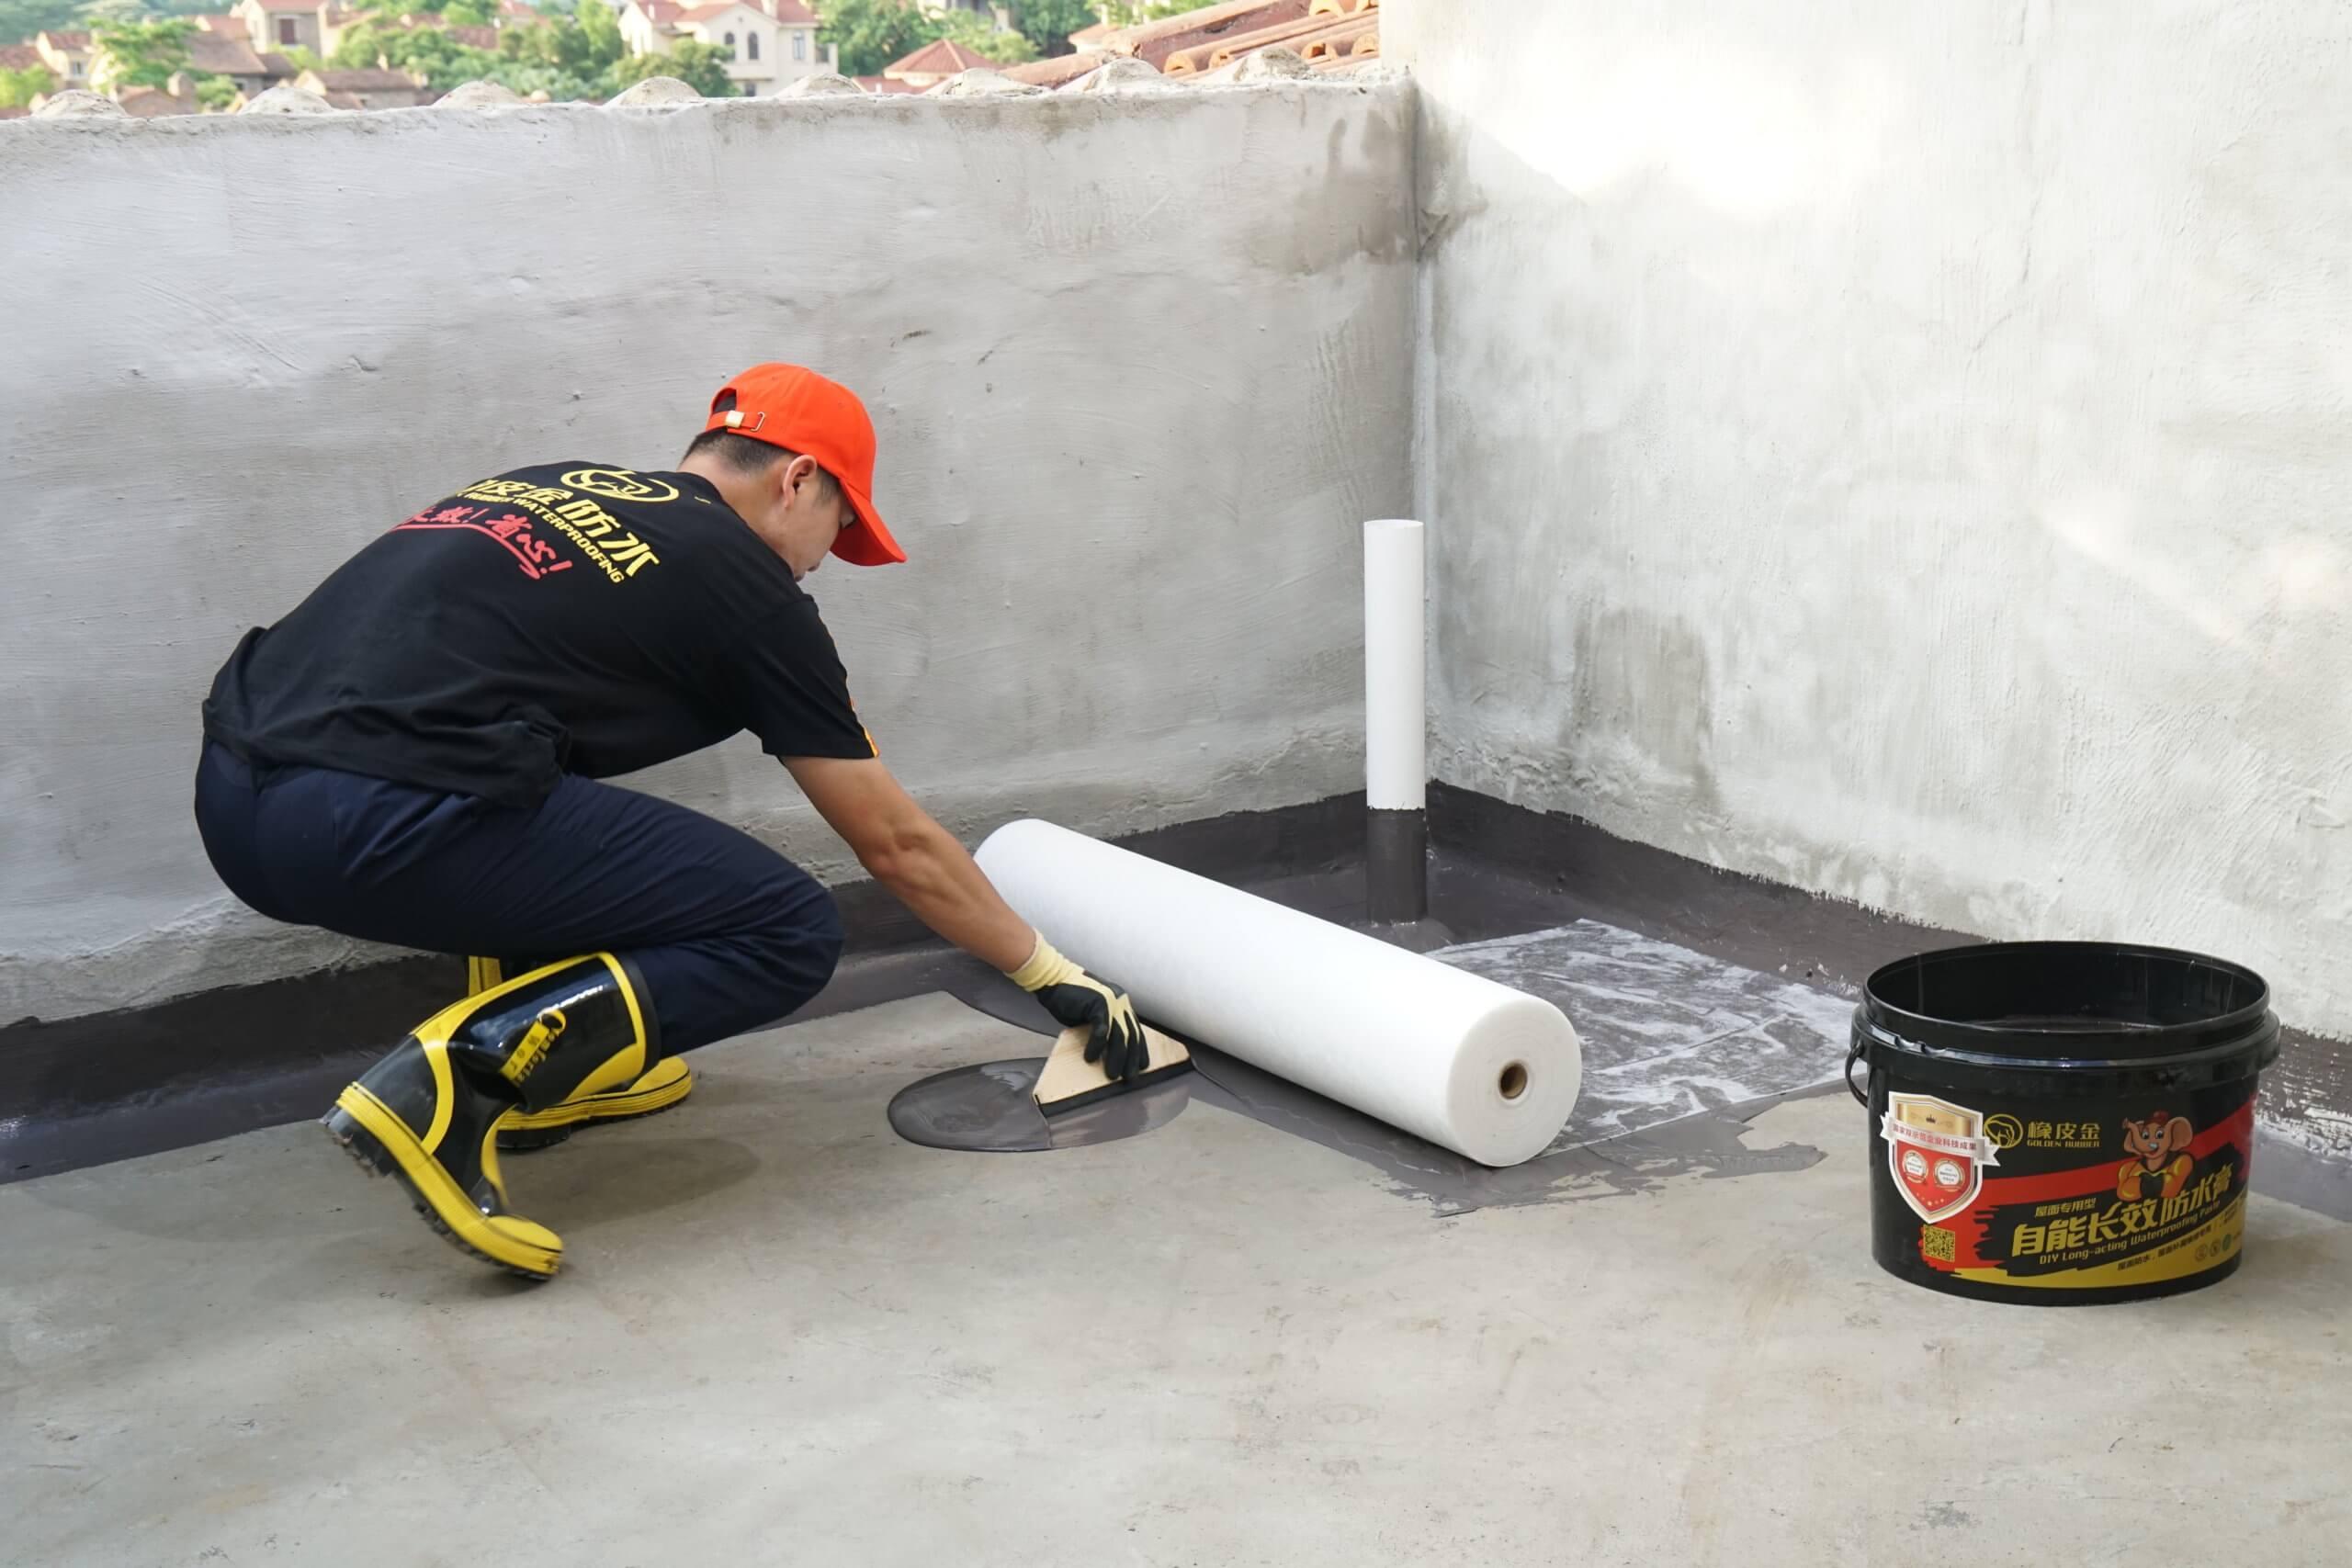 traditional method of installing waterproofing membranes